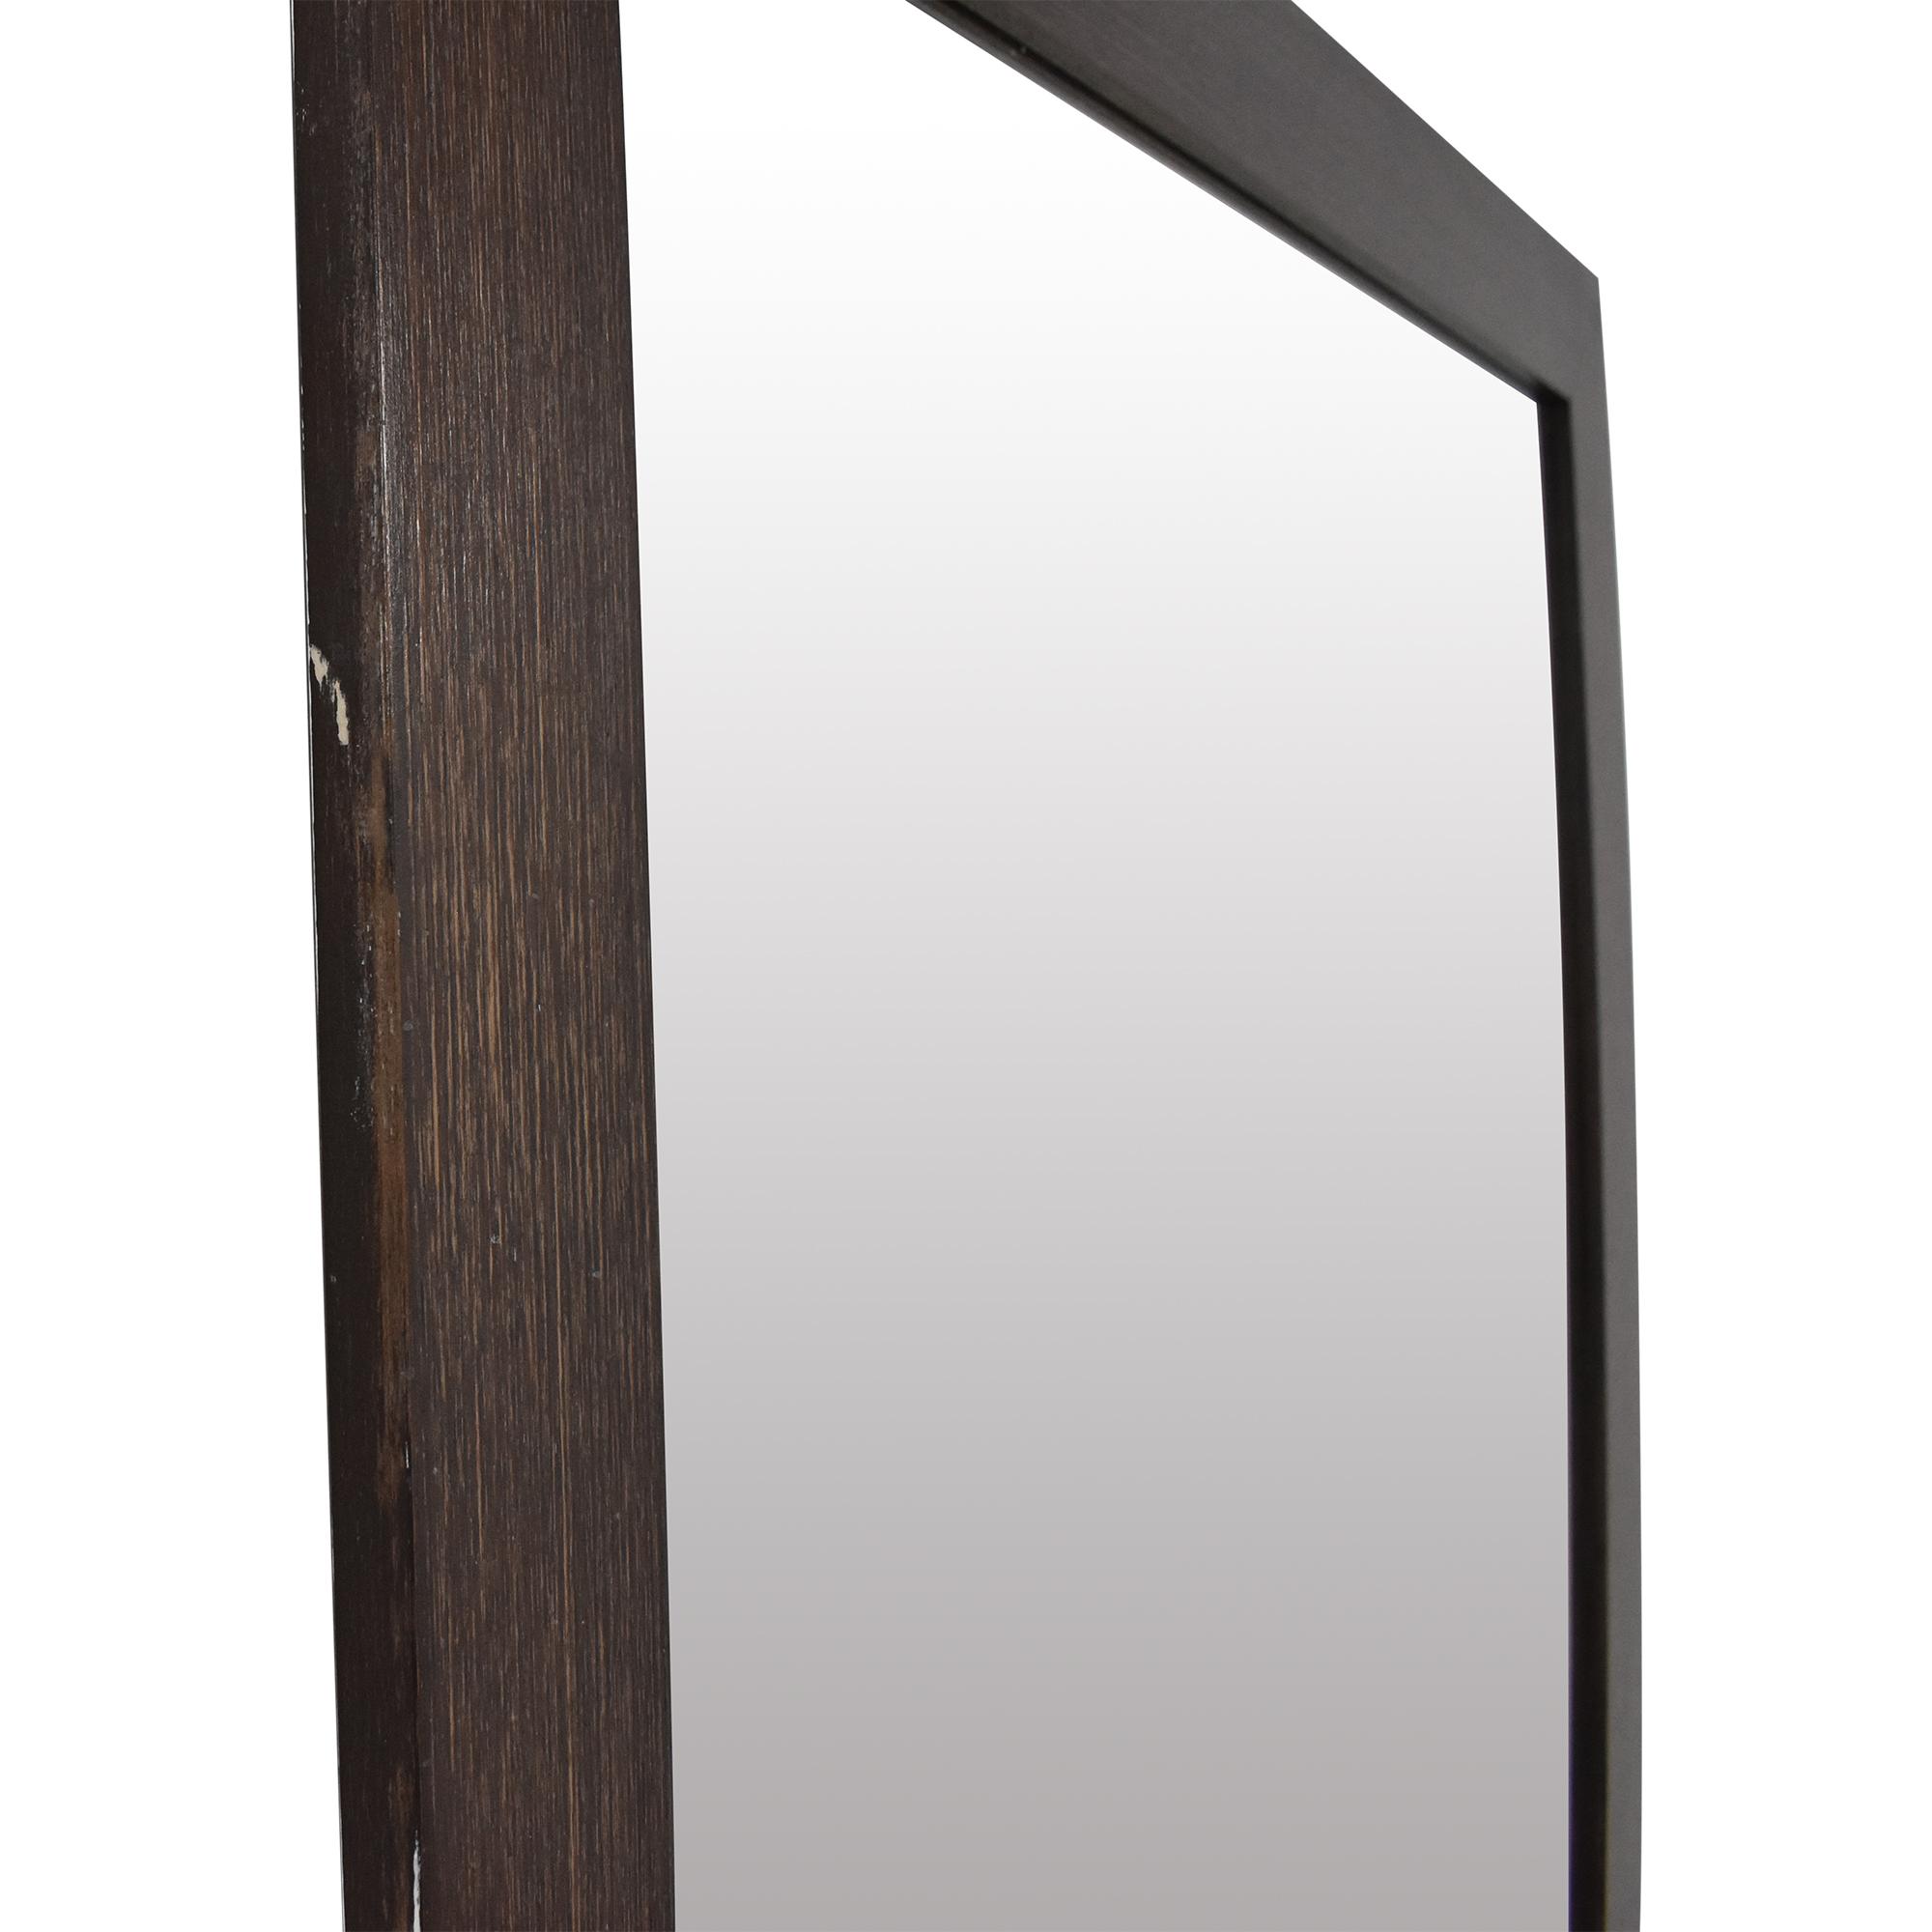 Tall Framed Mirror dimensions